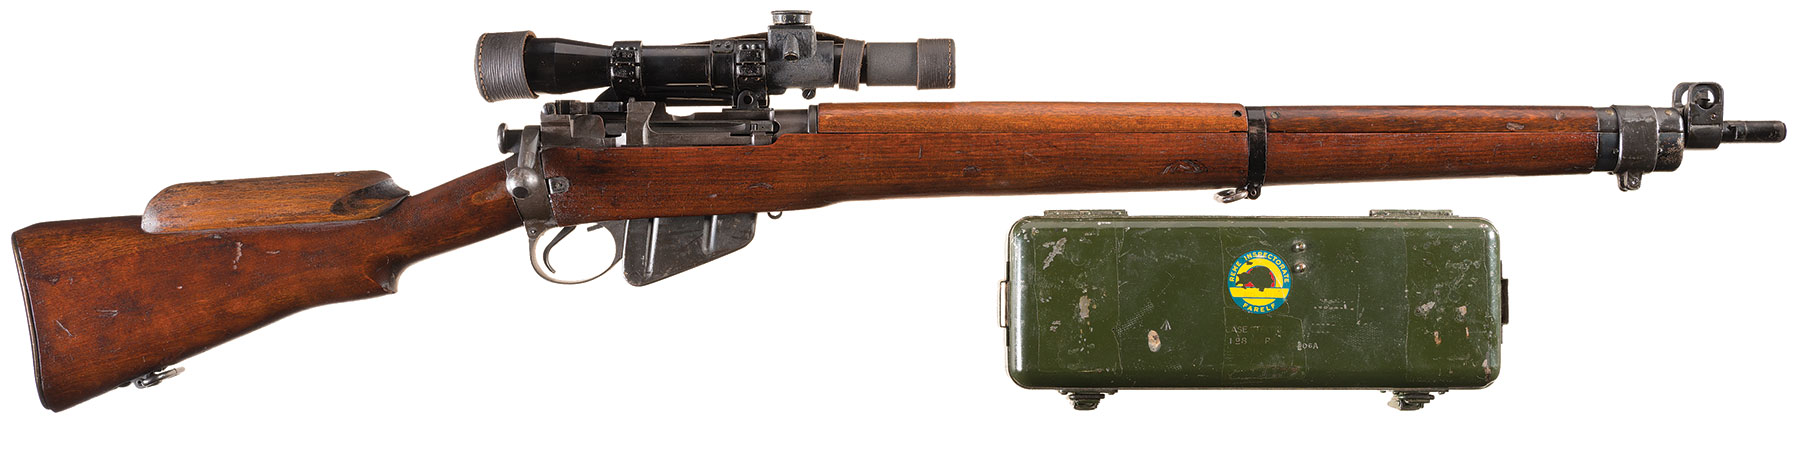 Savage No 4 MK1 (T) Sniper